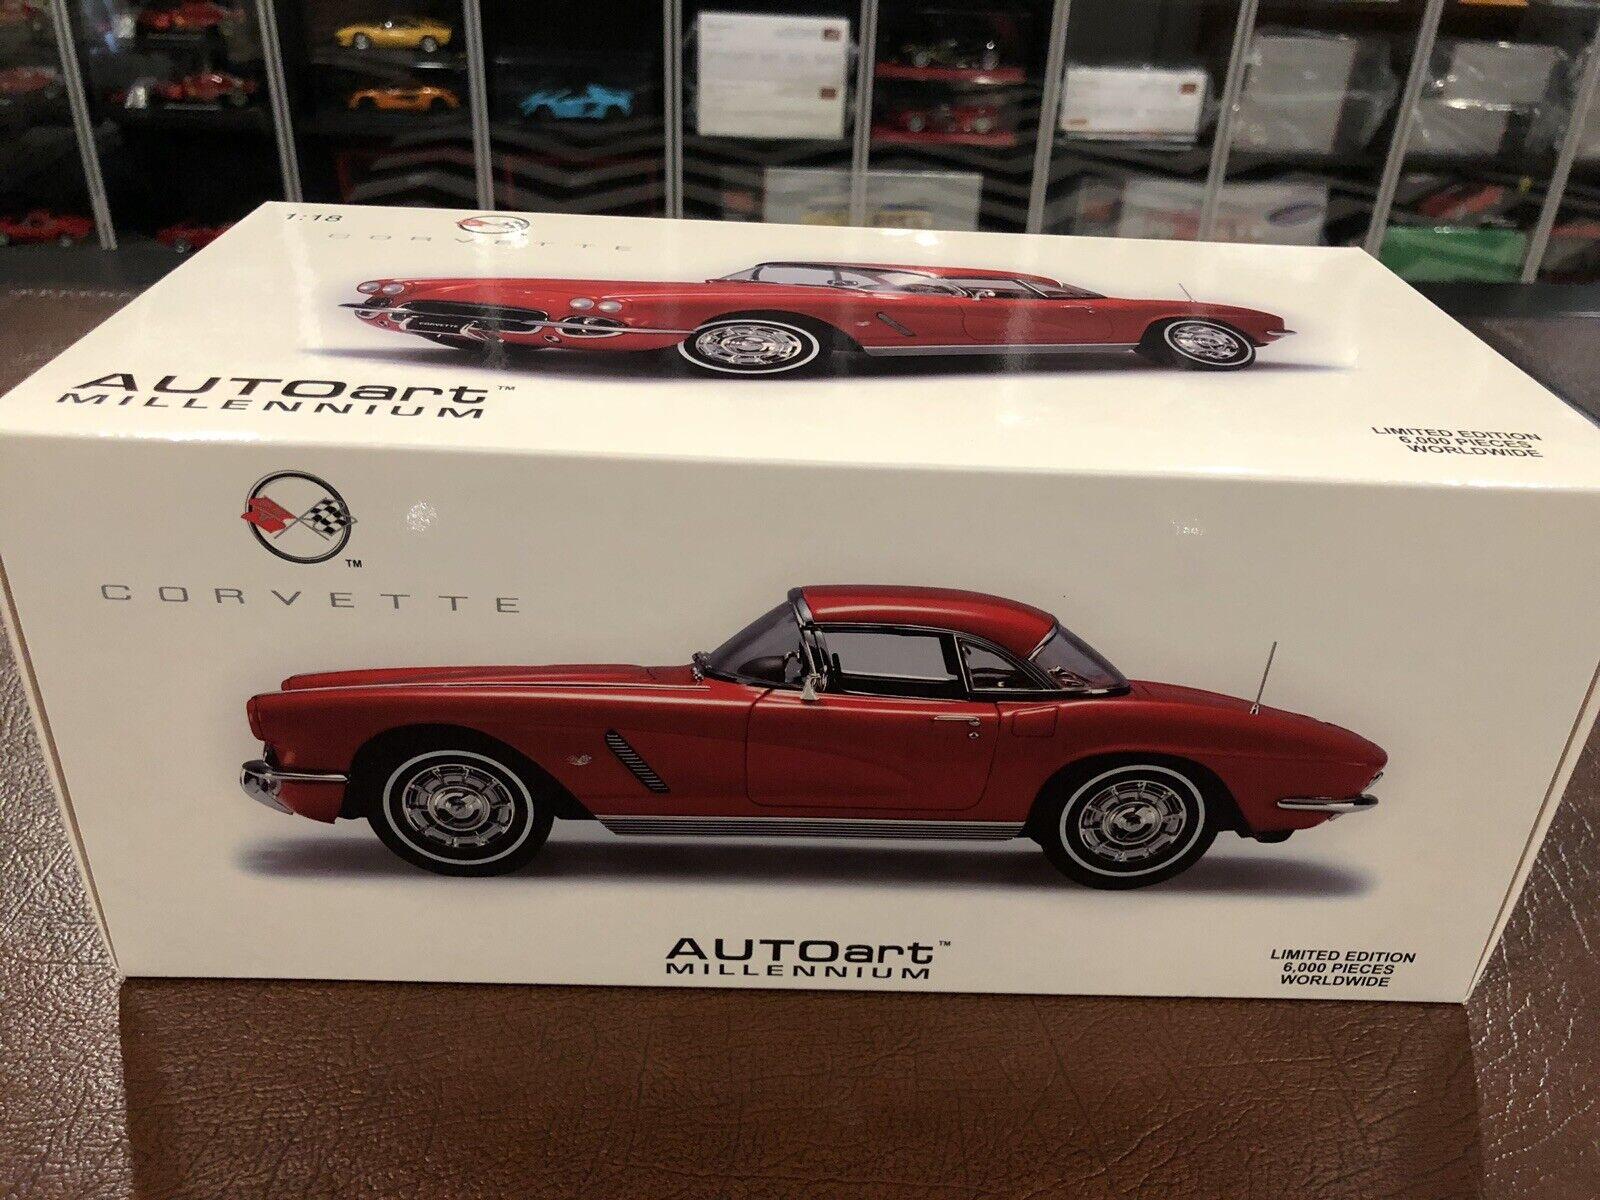 1 18 Autoart 1962 Chevrolet Corvette, NEW, Factory Sealed, RARE